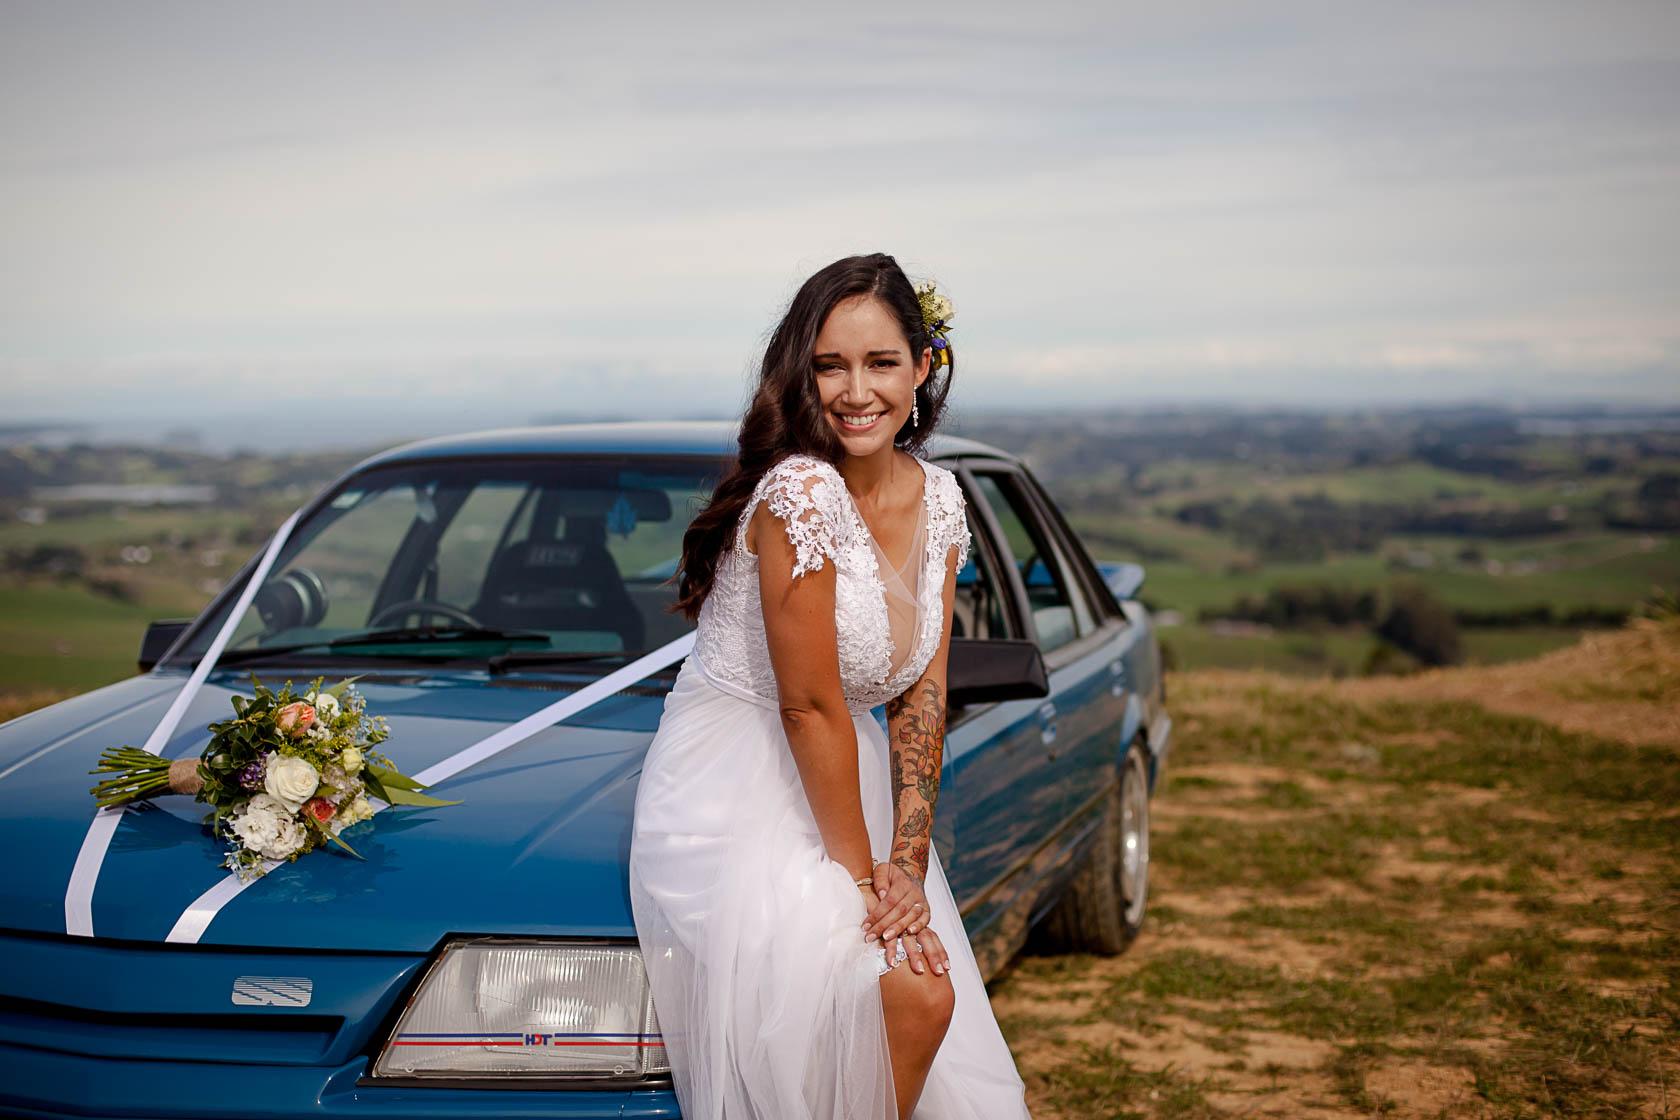 Matakana-wedding-auckland6221.jpg